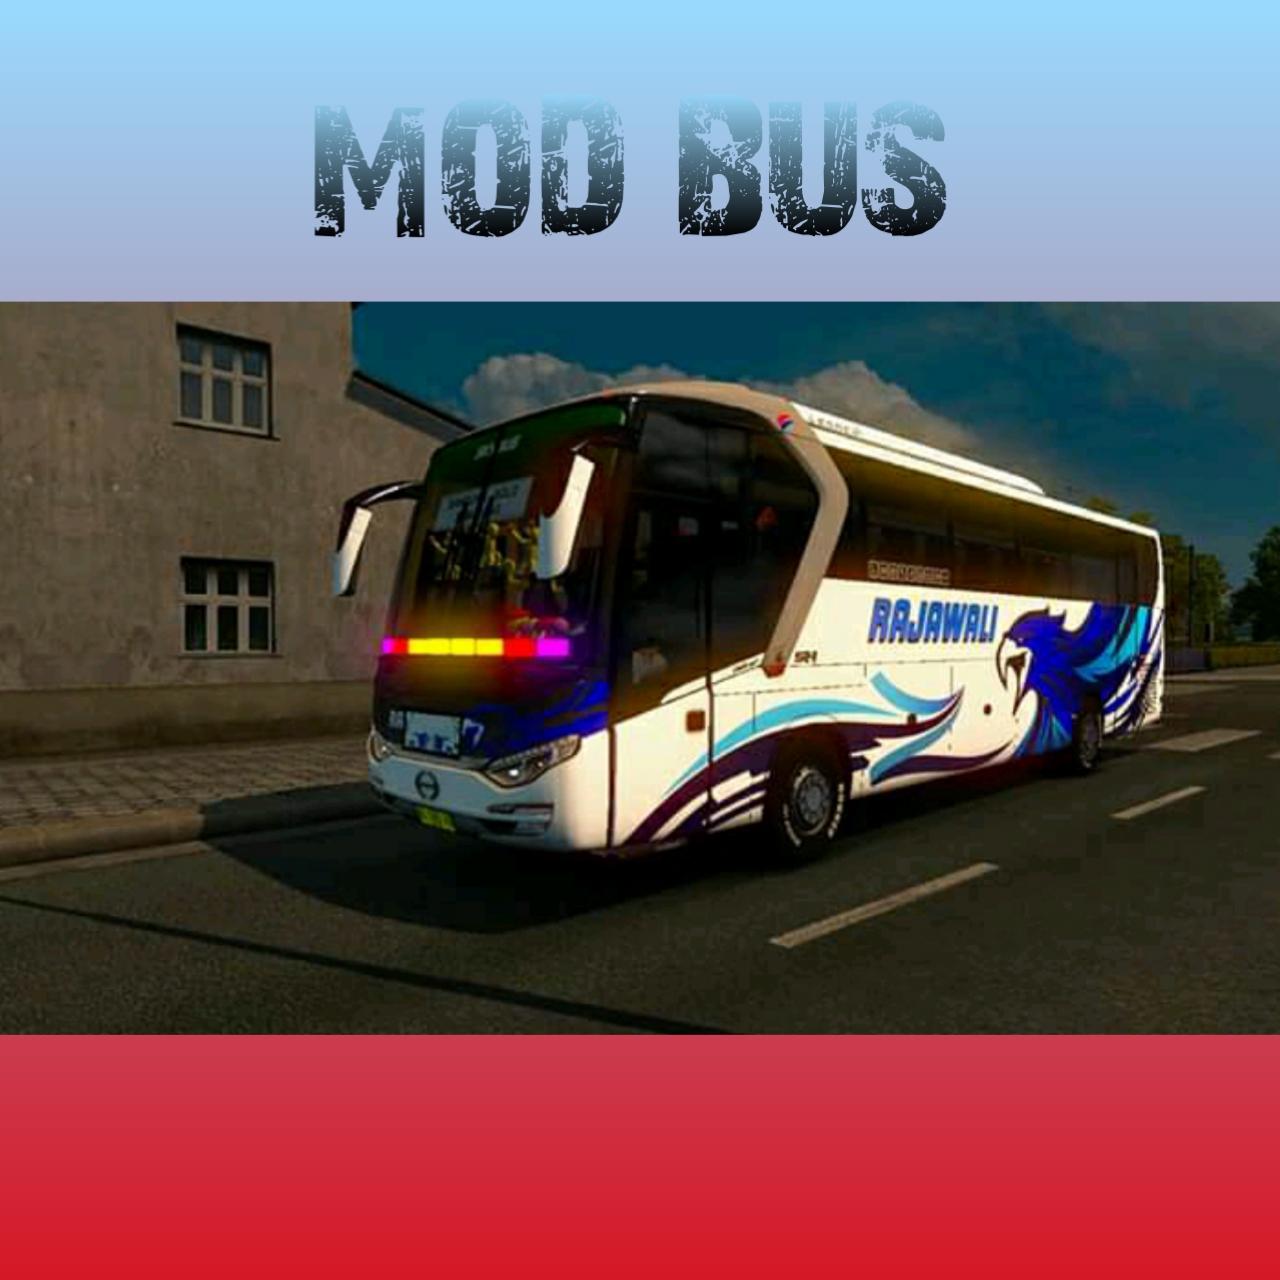 Hallo sahabat euro truck simulator 2 kali ini saya mau membagikan sebuah mod graphic yaitu mod bus anl m annas co bimo wahyu ets2 1 25 1 34